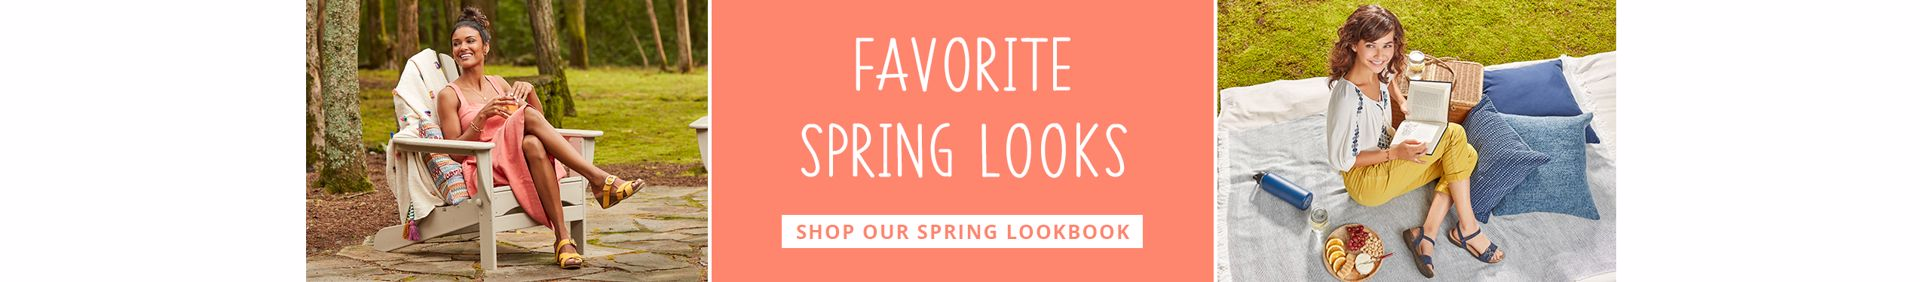 Dansko Spring 2019 Lookbook